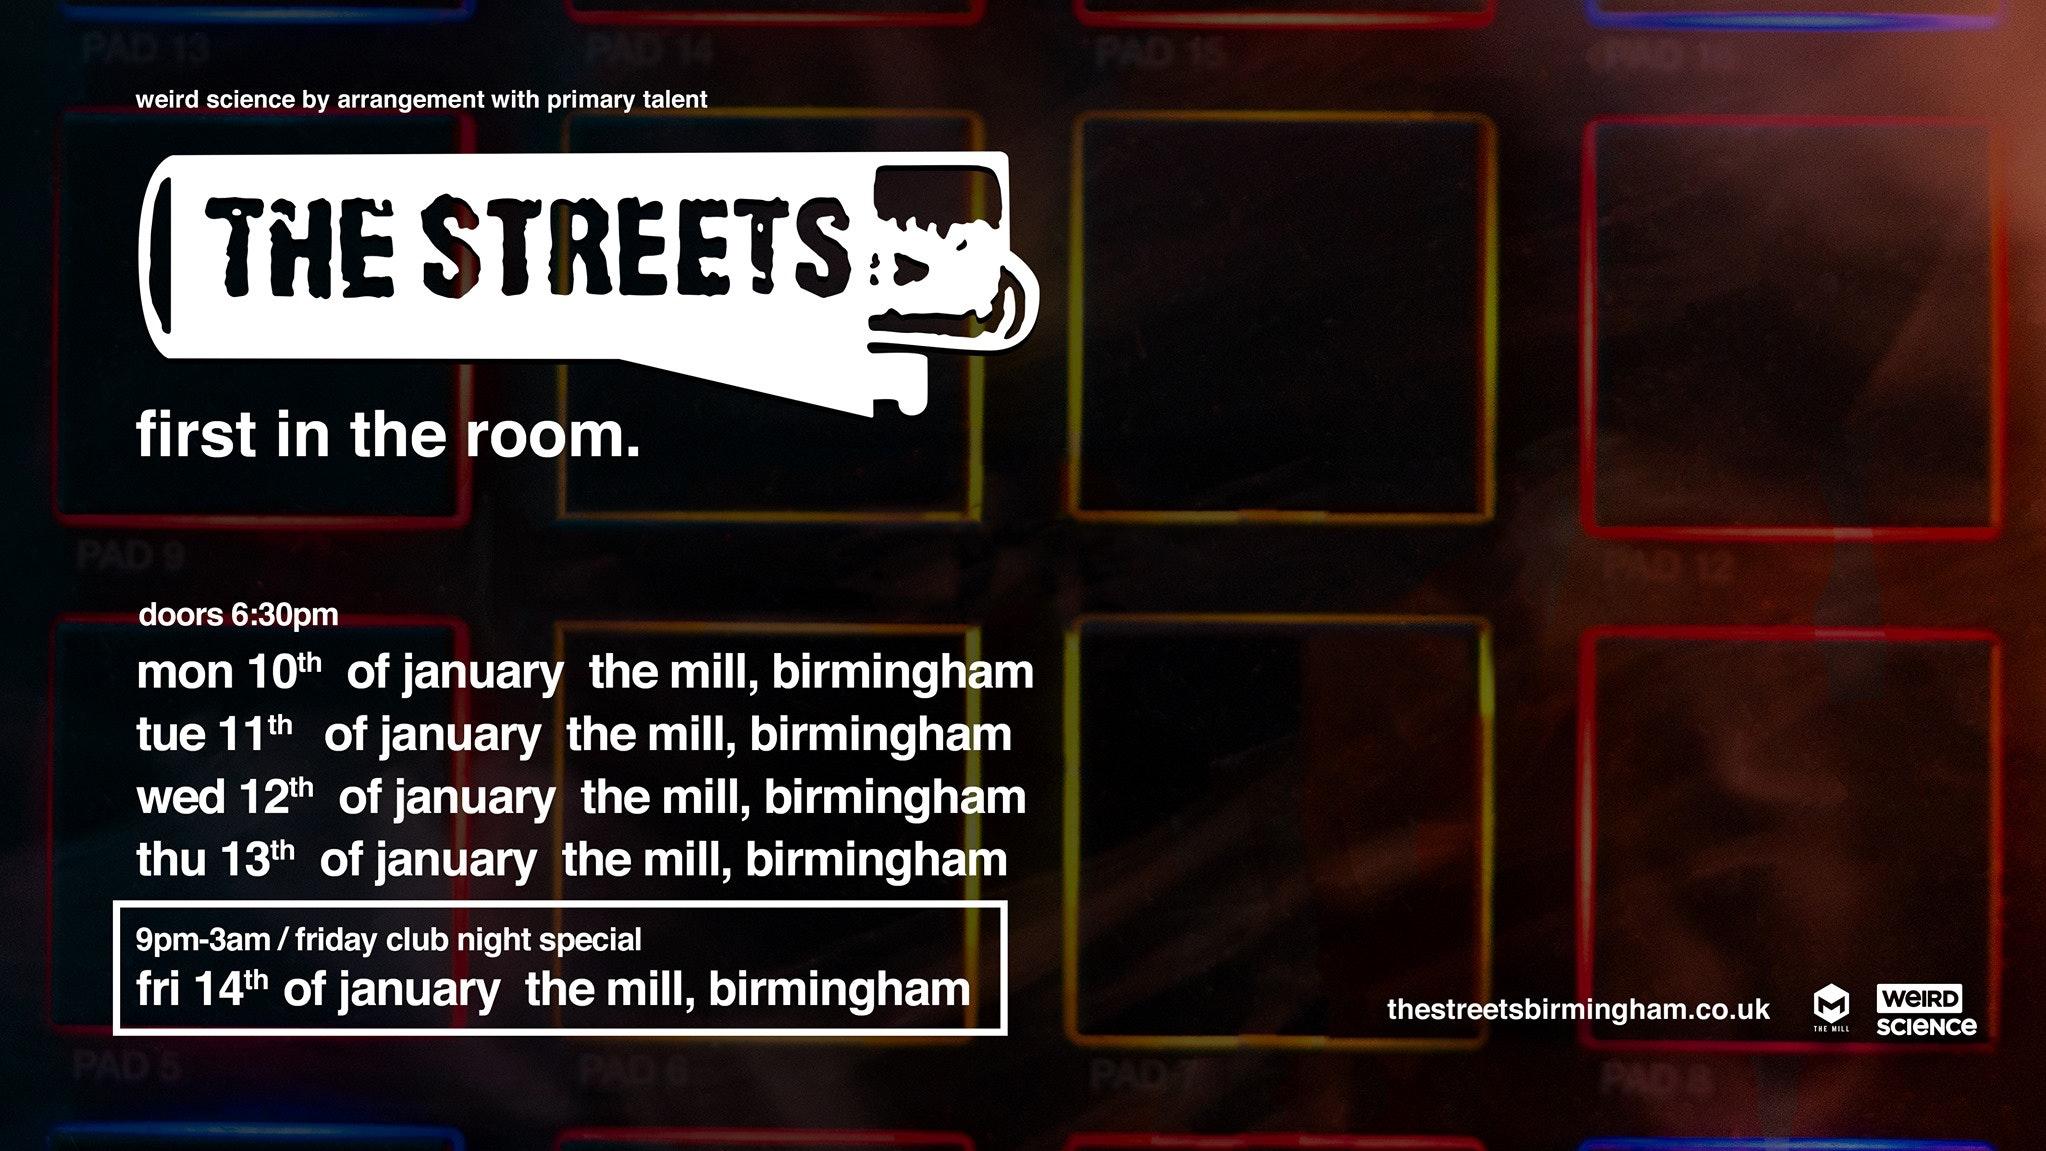 the streets : birmingham